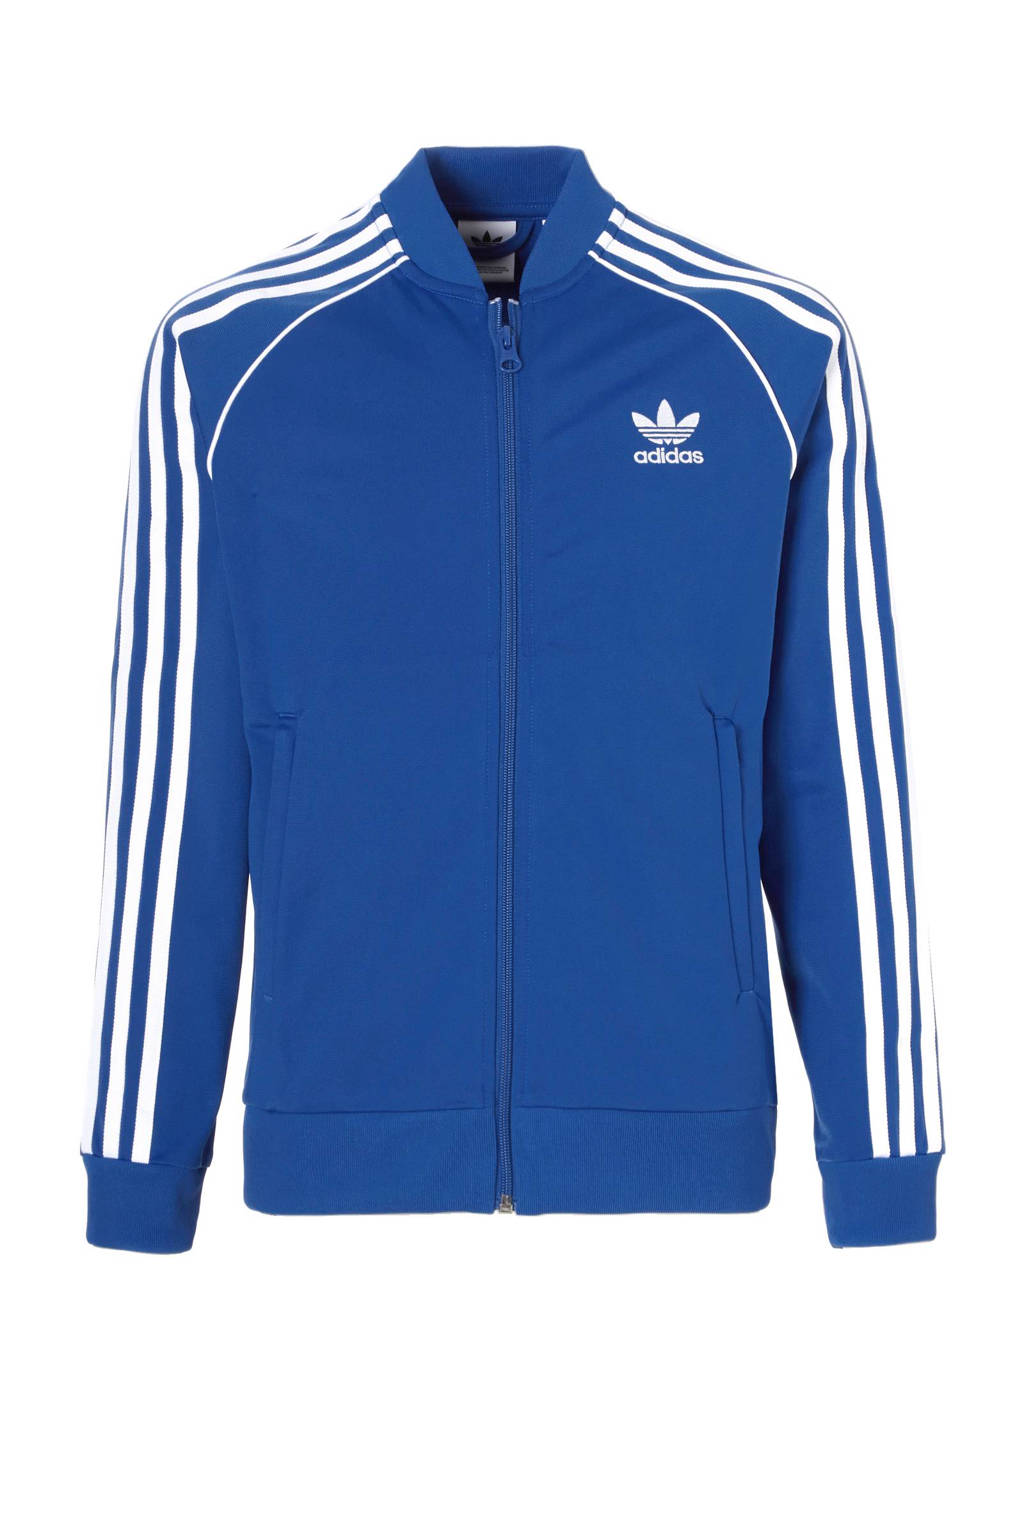 37f4d845382 adidas originals vest, Blauw/wit